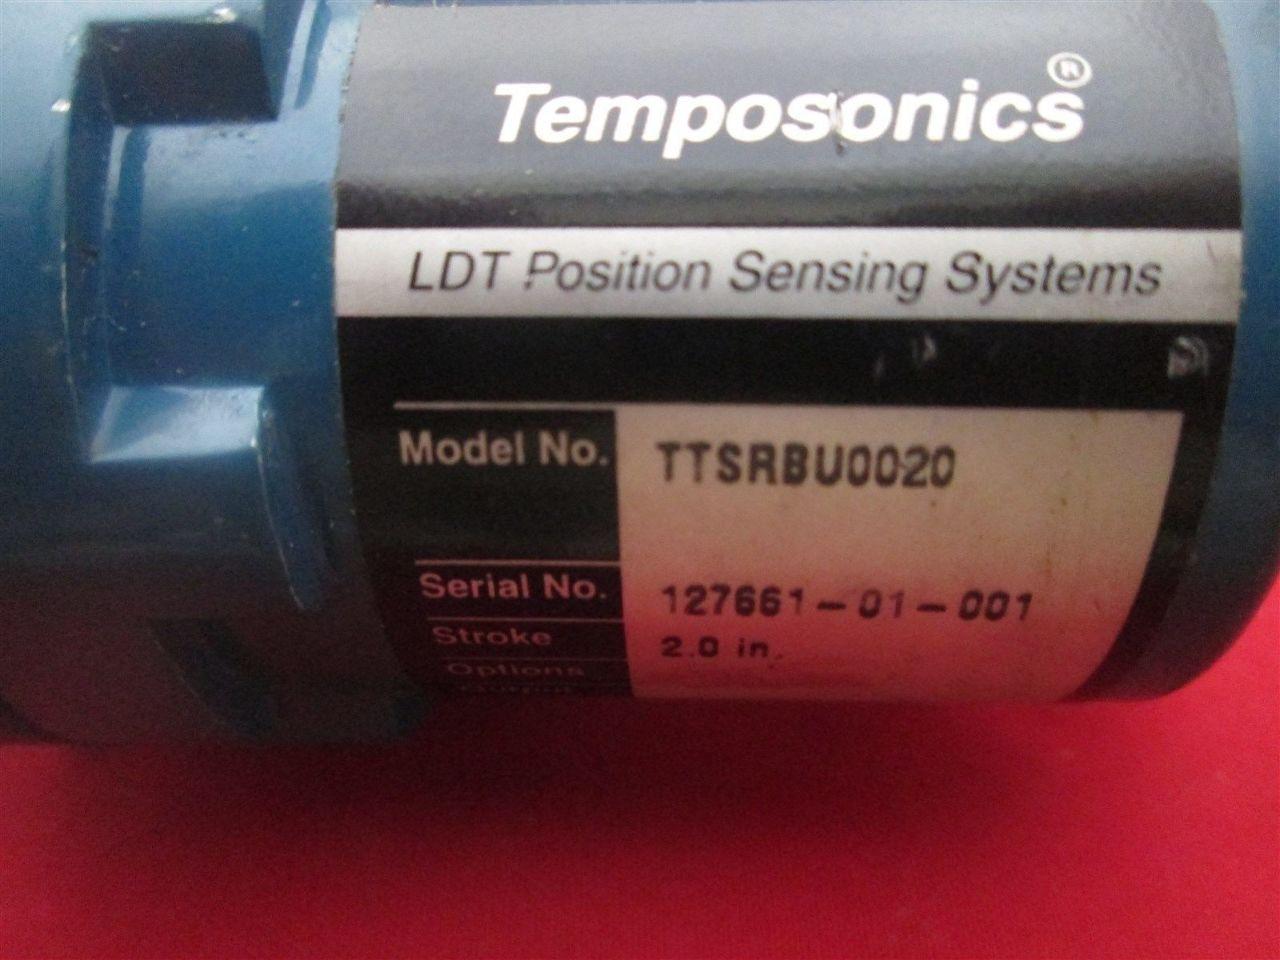 Mts Ttsrbu0020 Temposonics Ldt Position Sensor Process